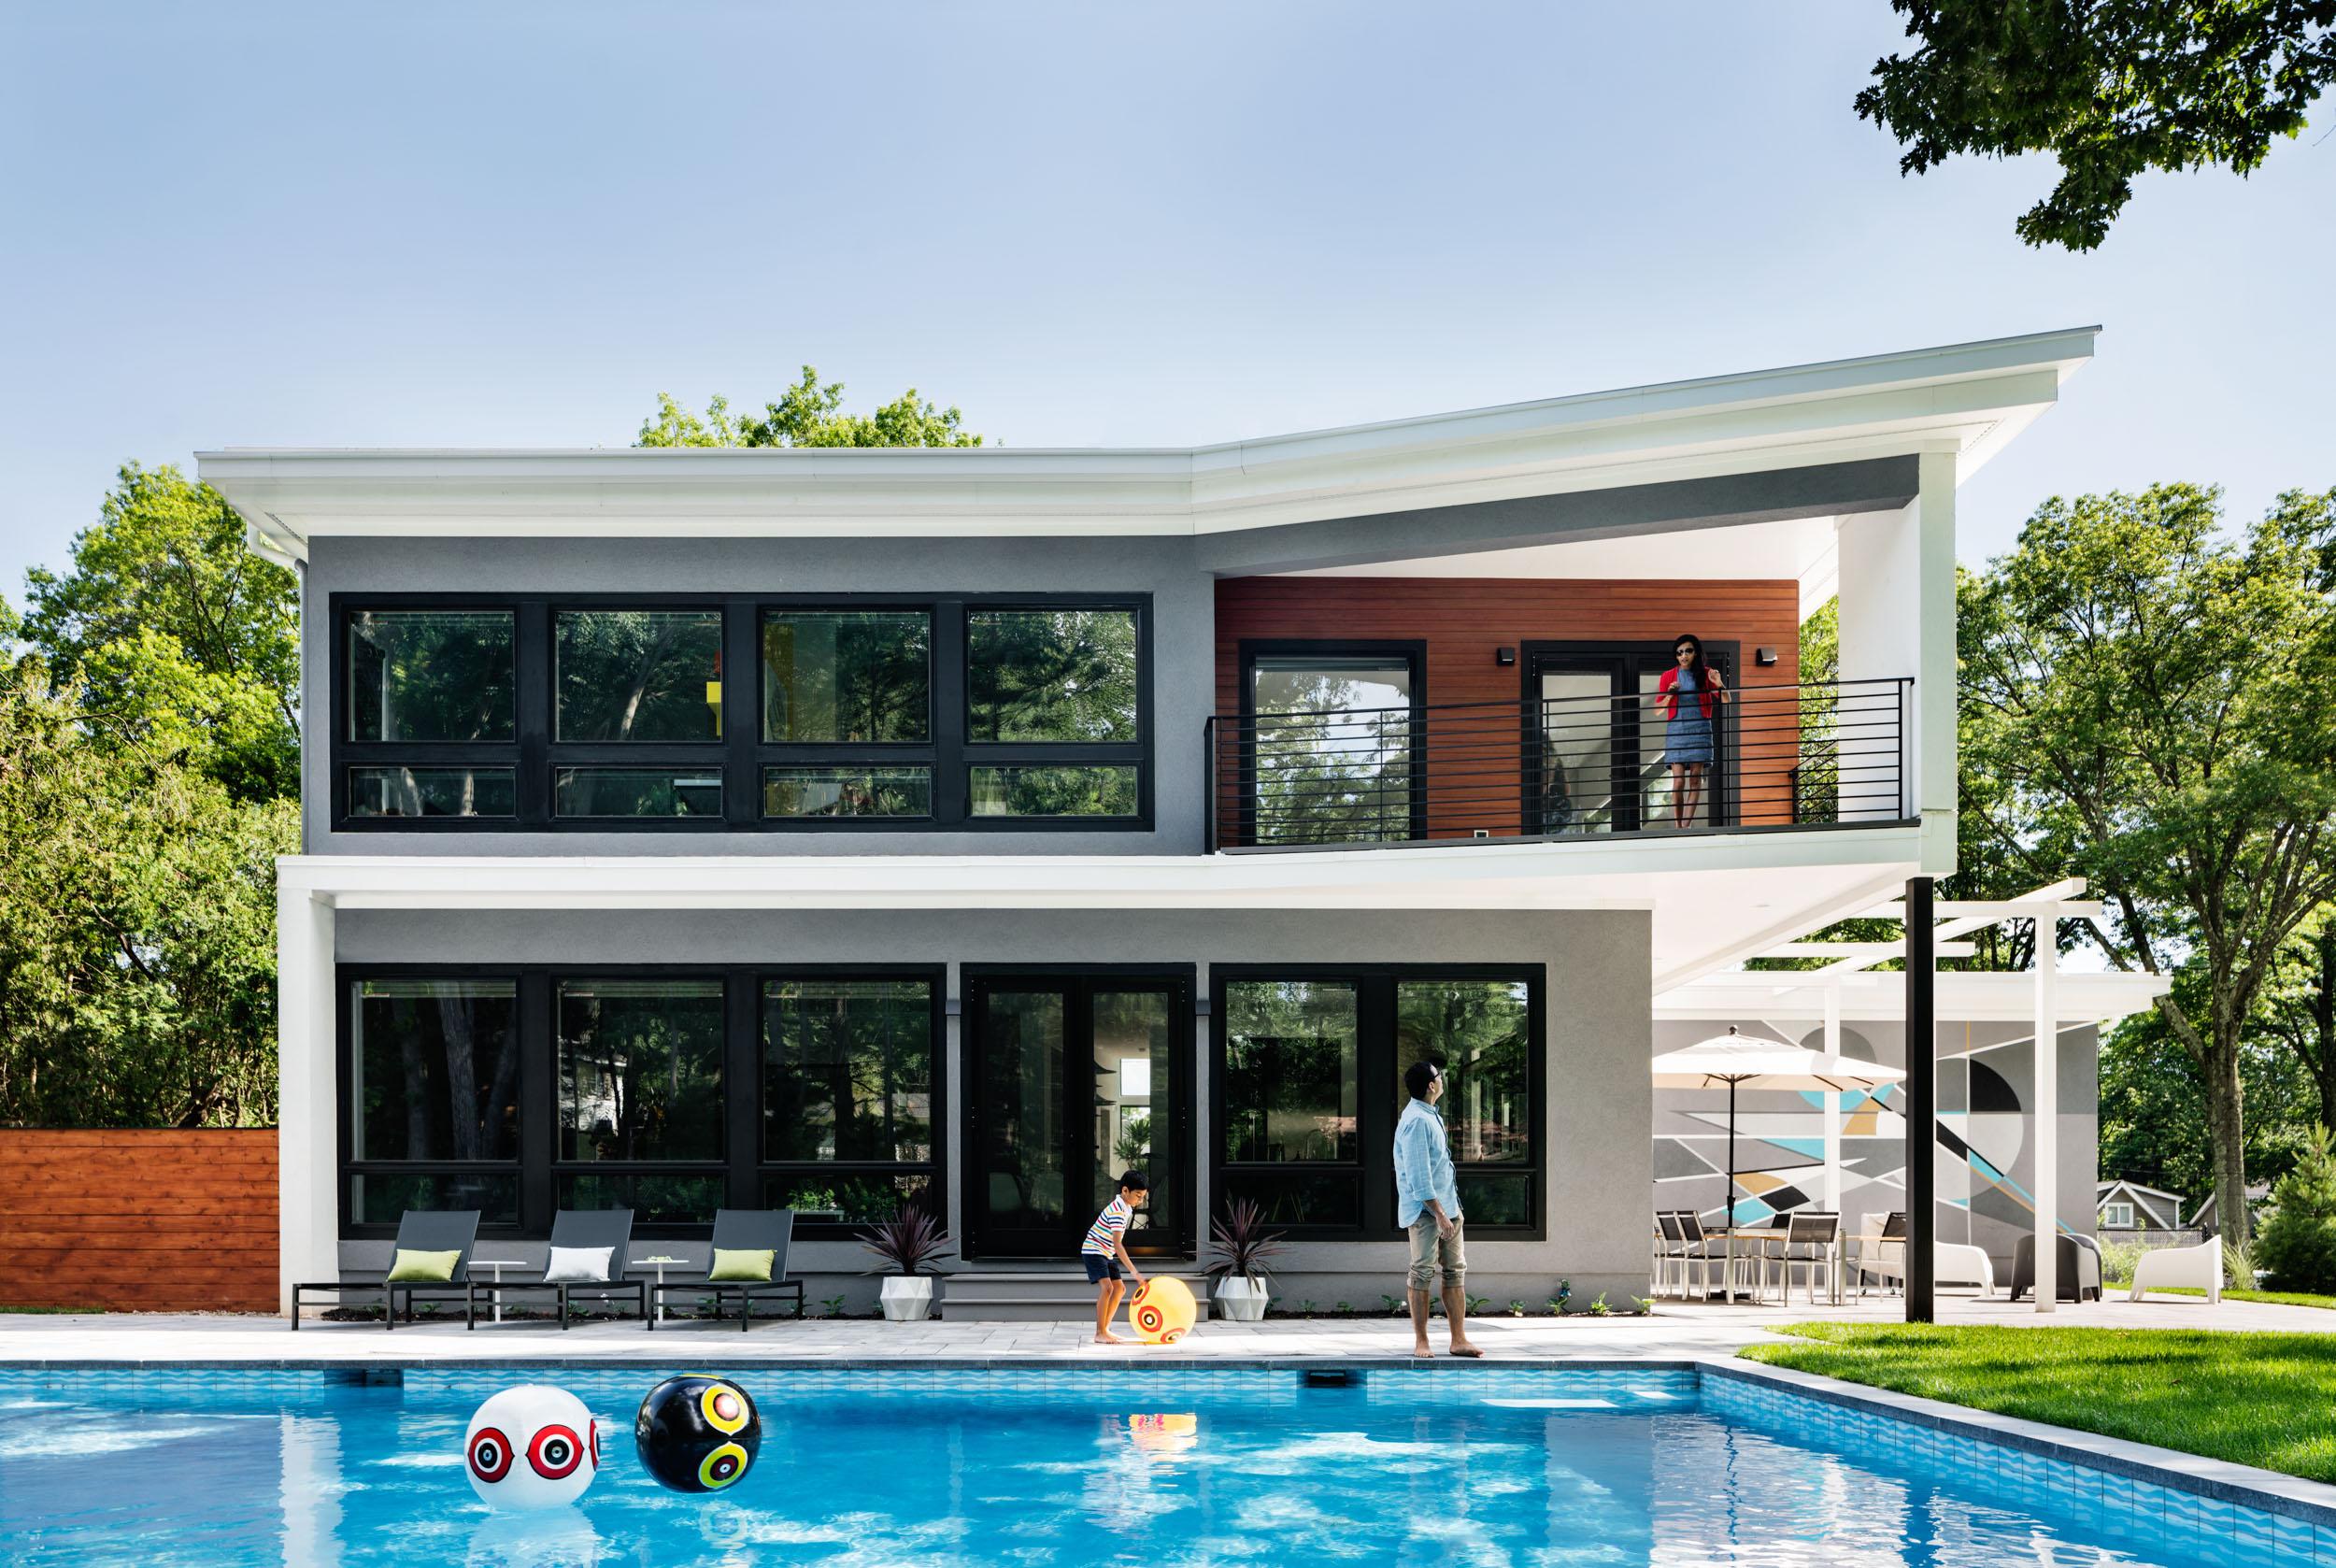 Roslyn Road Ridgewood, NJ Z+ Architects